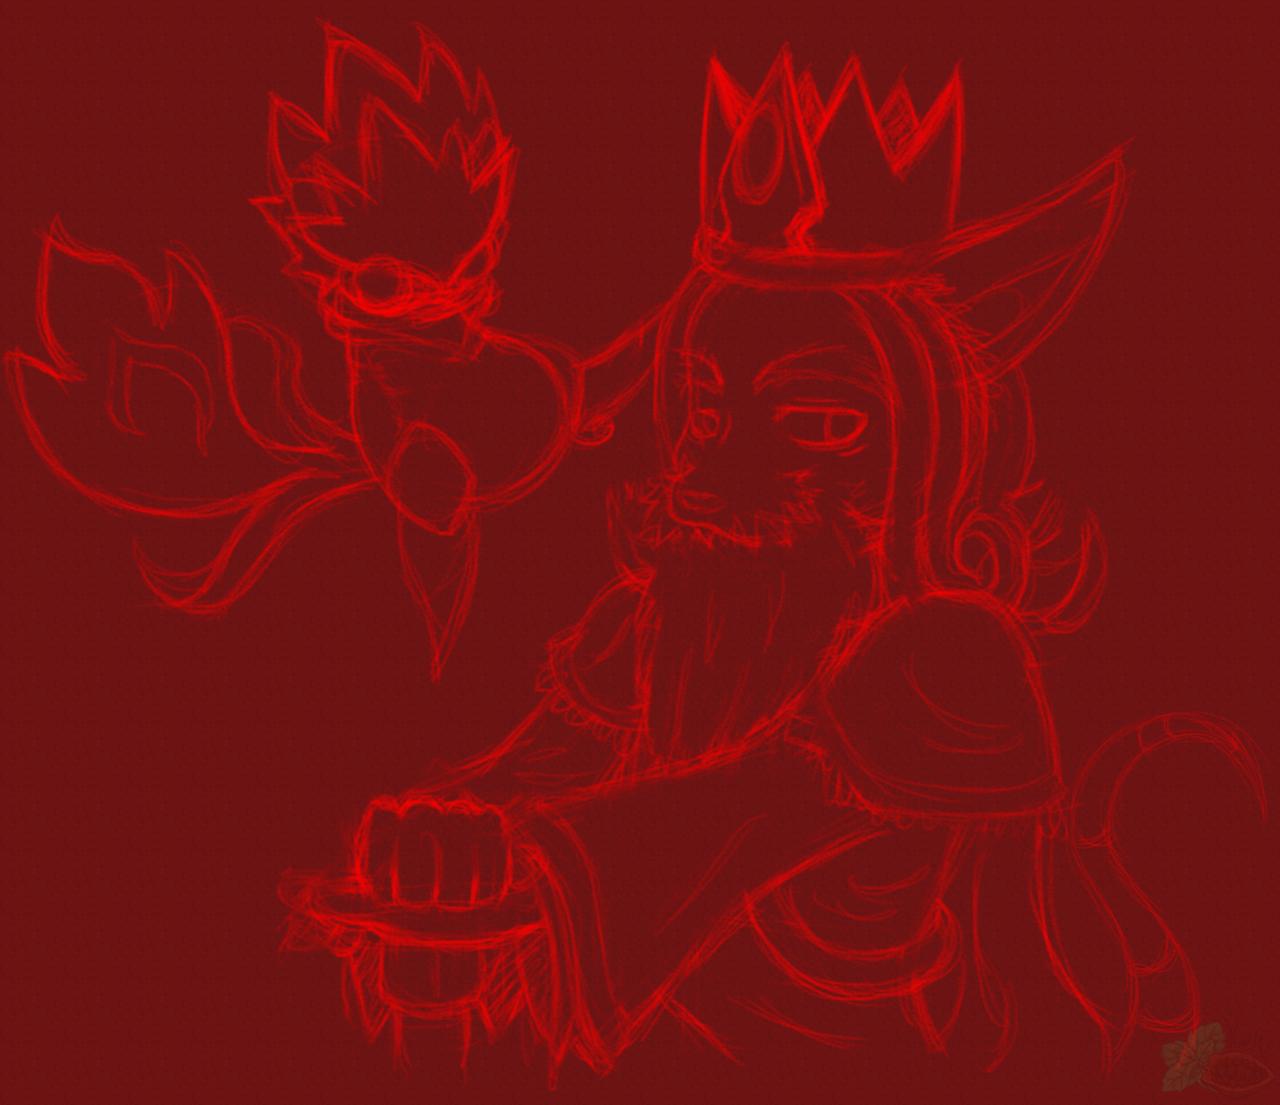 [RK x GS] Zephyrus and Tinder (Sketch)